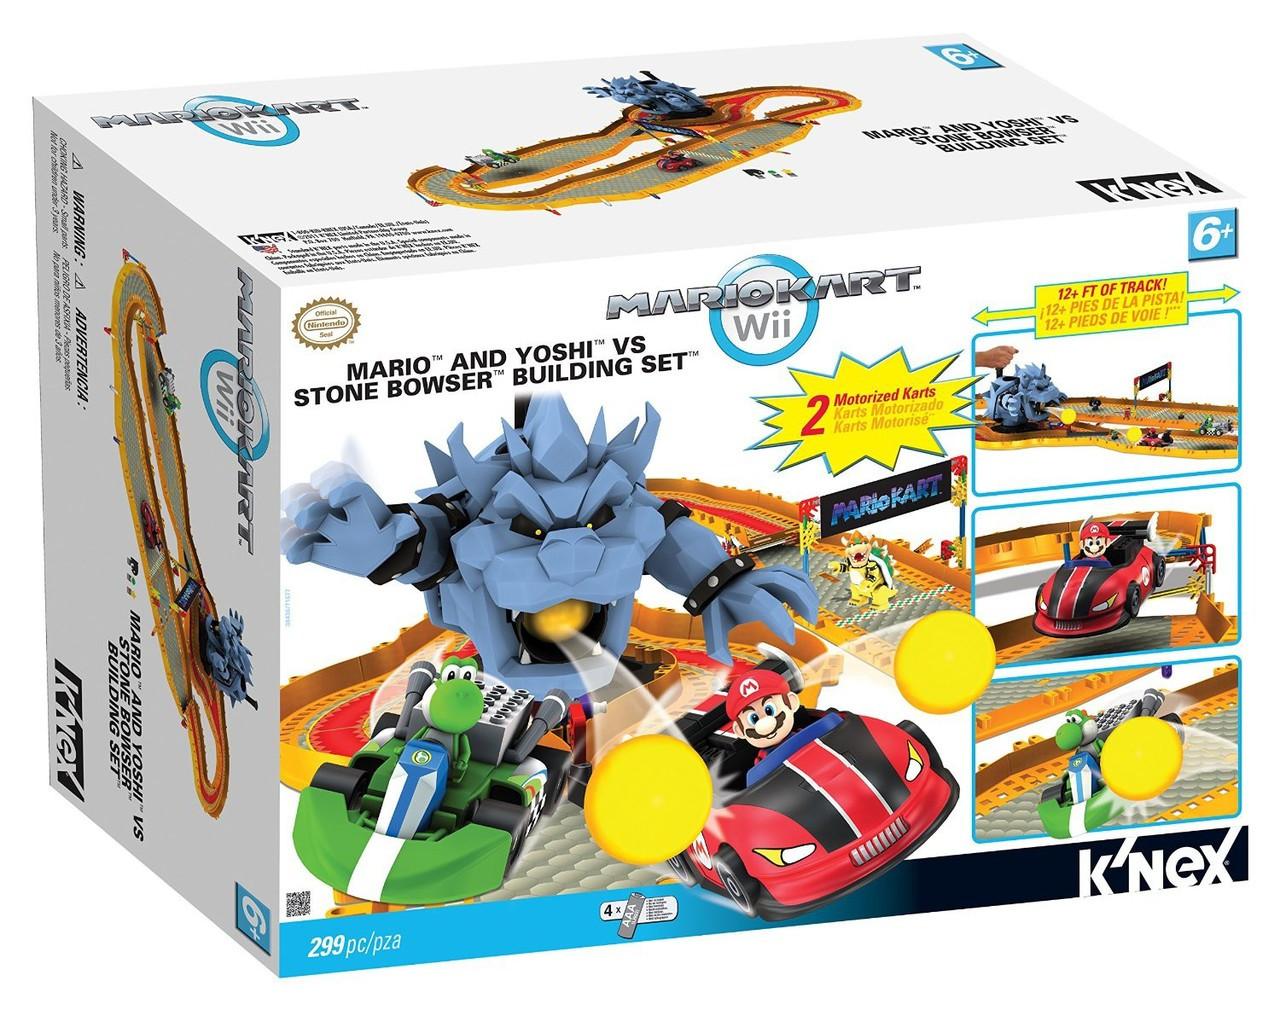 K Nex Super Mario Mario Kart Wii Mario And Yoshi Vs Stone Bowser Set 38436